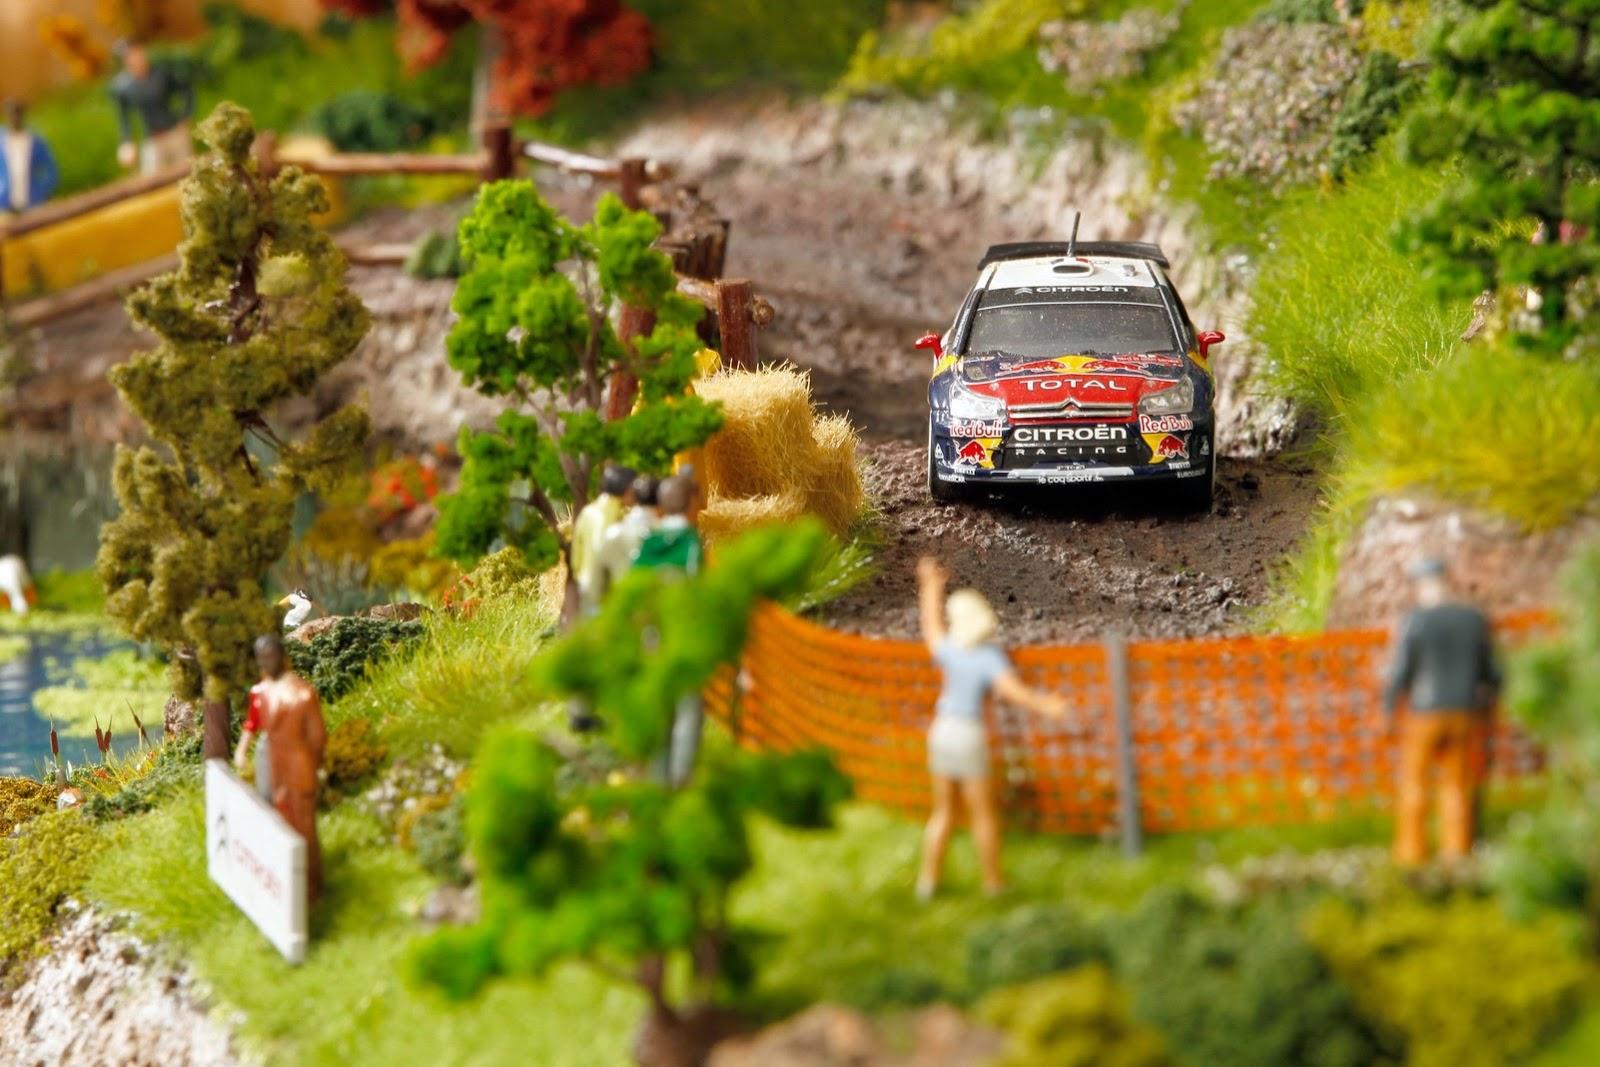 citroen celebrates rally success with impressive diorama